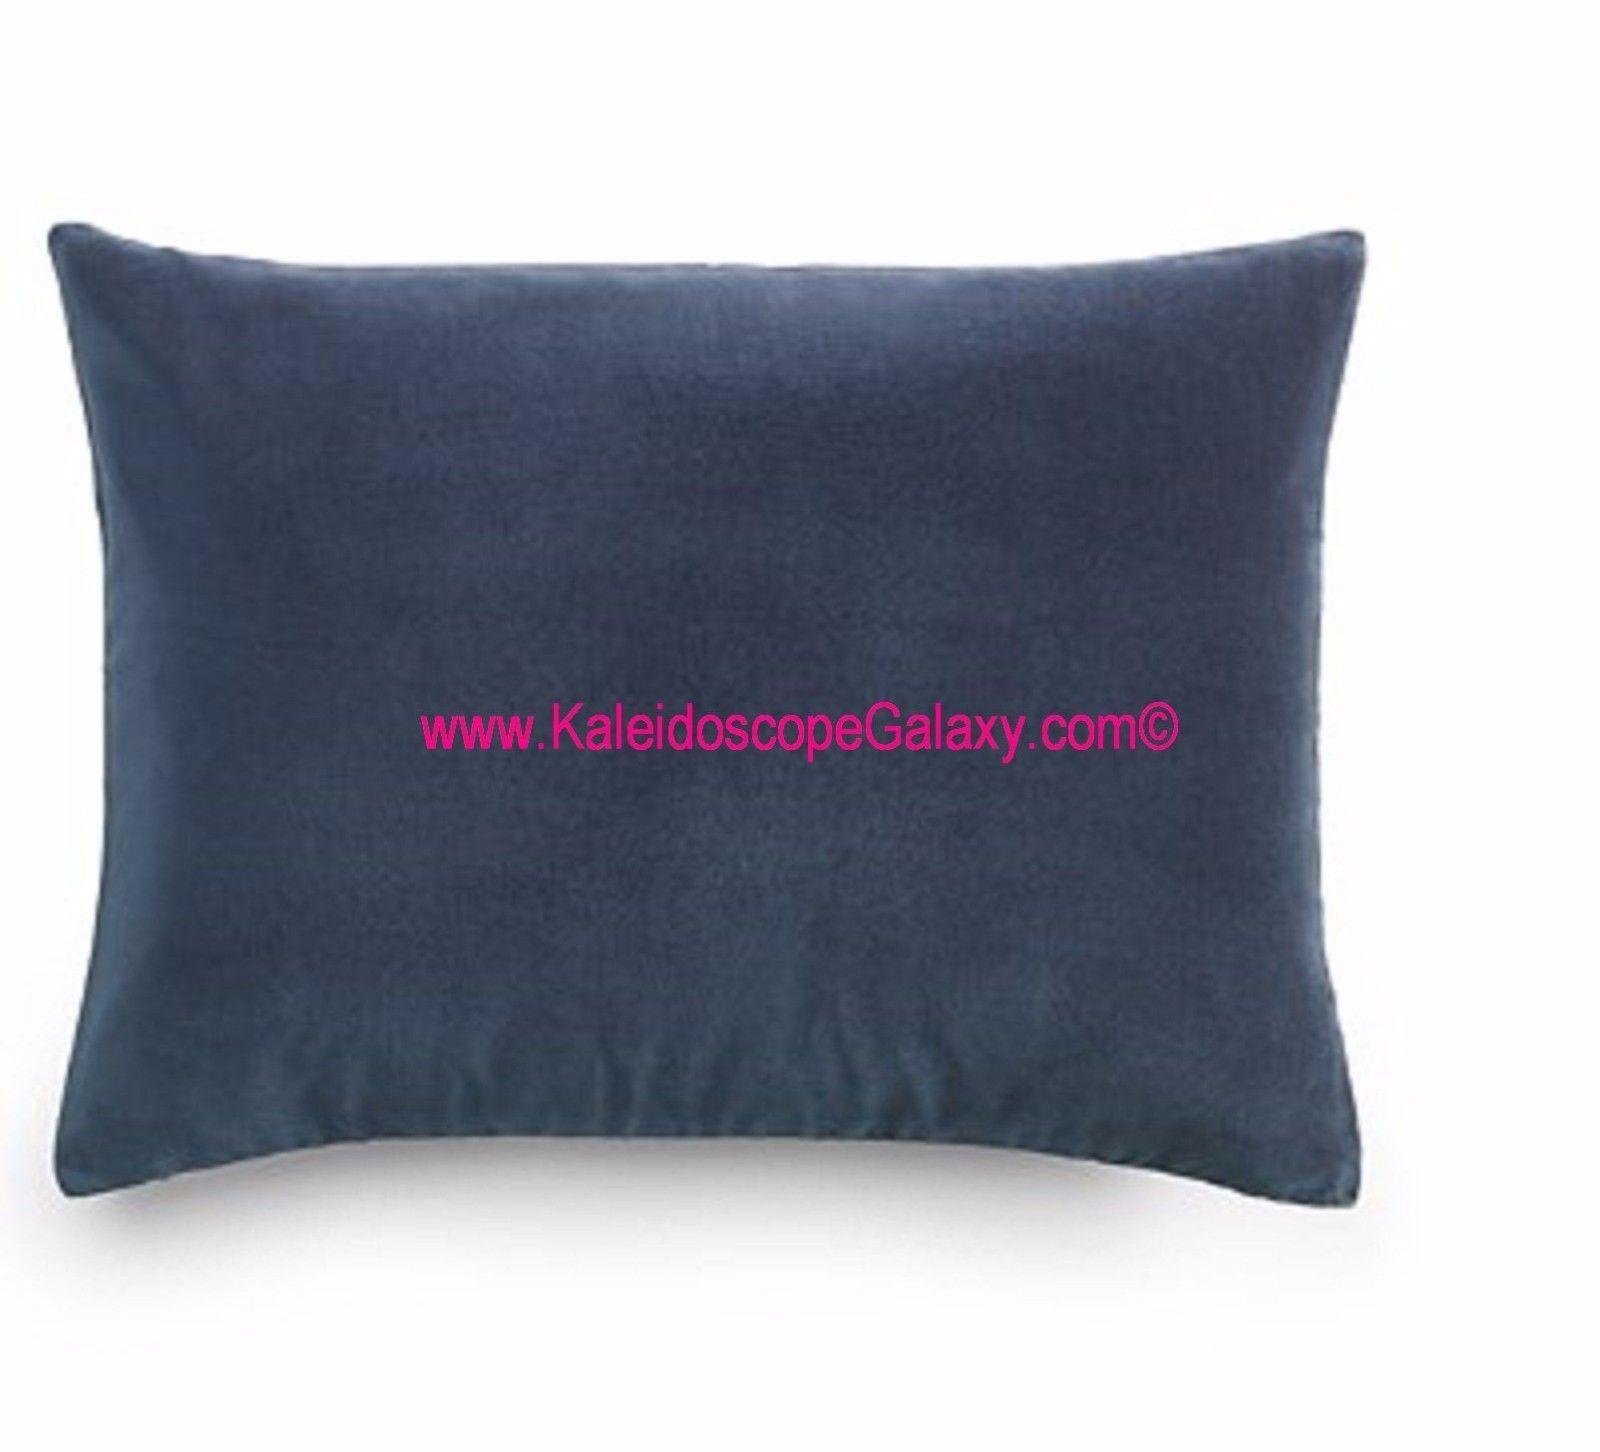 Blue decorative bed pillows - Decorative Bed Pillows 115630 Ralph Lauren Corso Campania Velvet Blue Throw Pillow Nwt